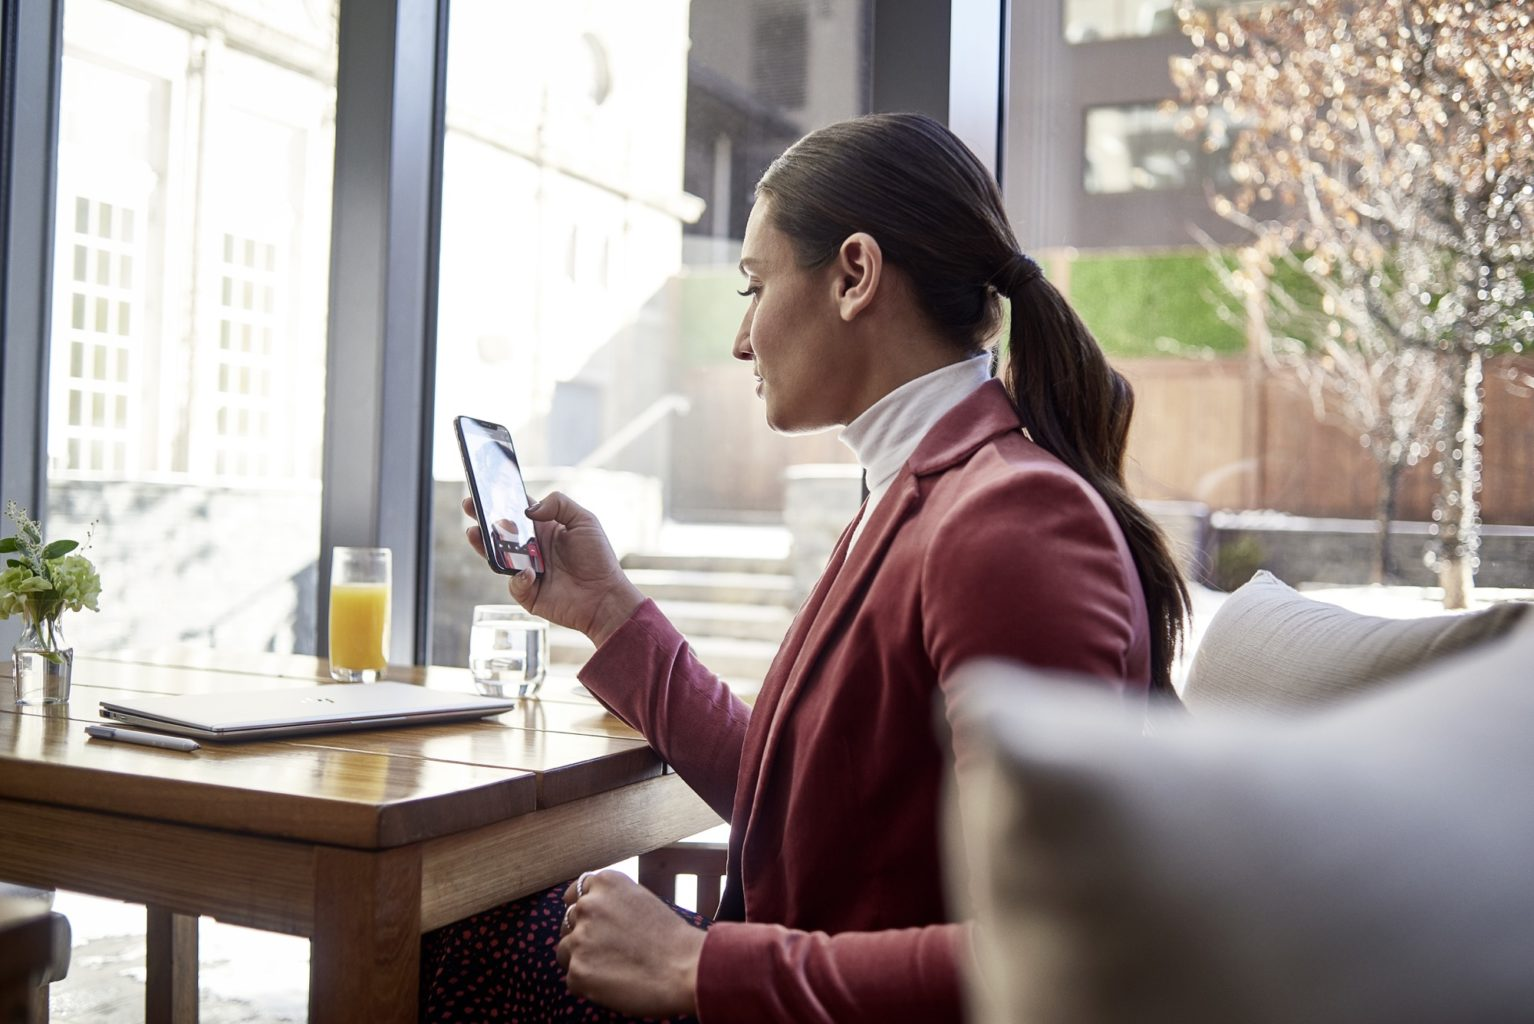 una persona seduta a un tavolo davanti a una finestra